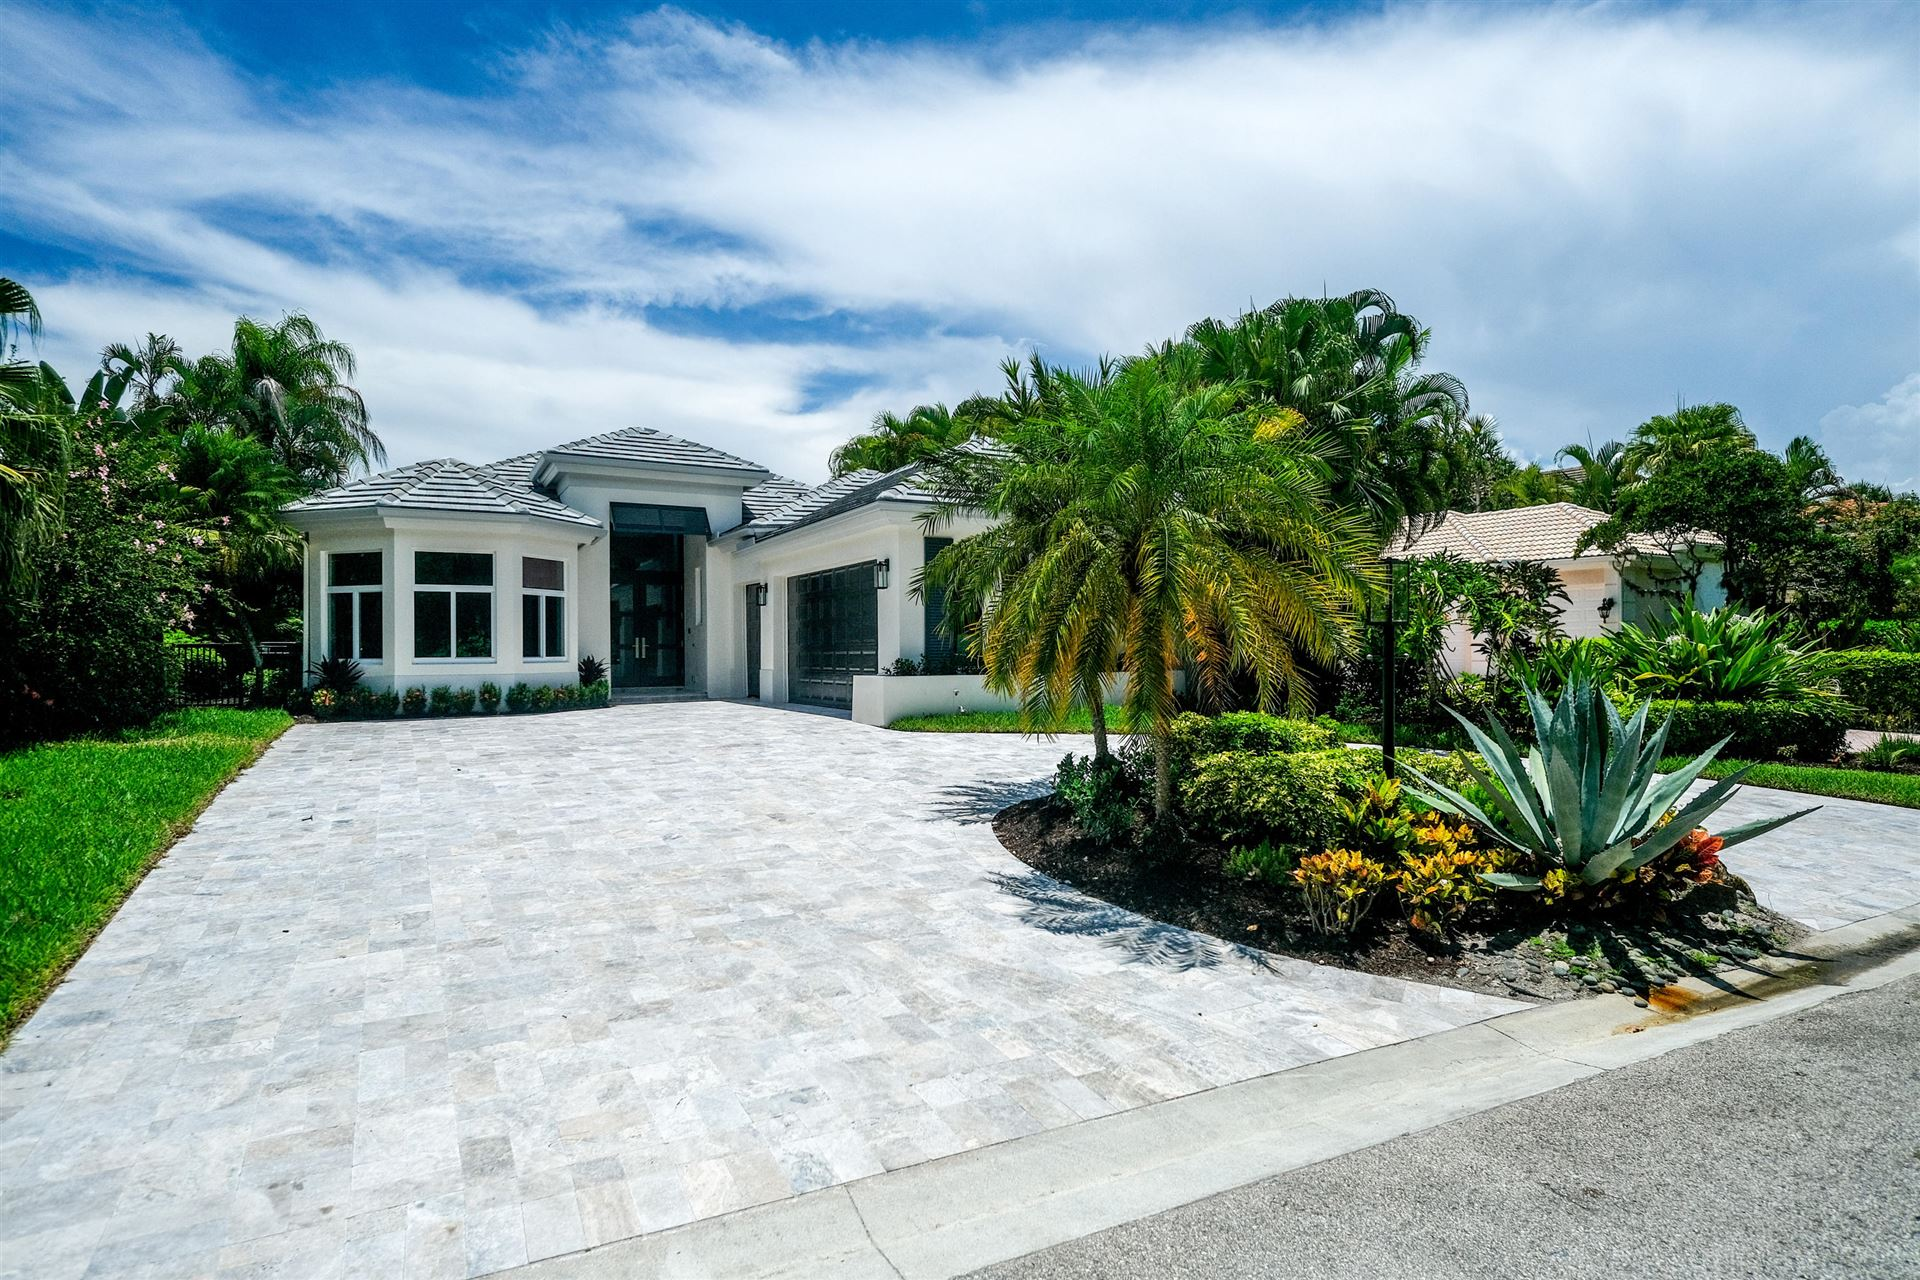 Photo of 3342 Degas Drive W, Palm Beach Gardens, FL 33410 (MLS # RX-10590960)